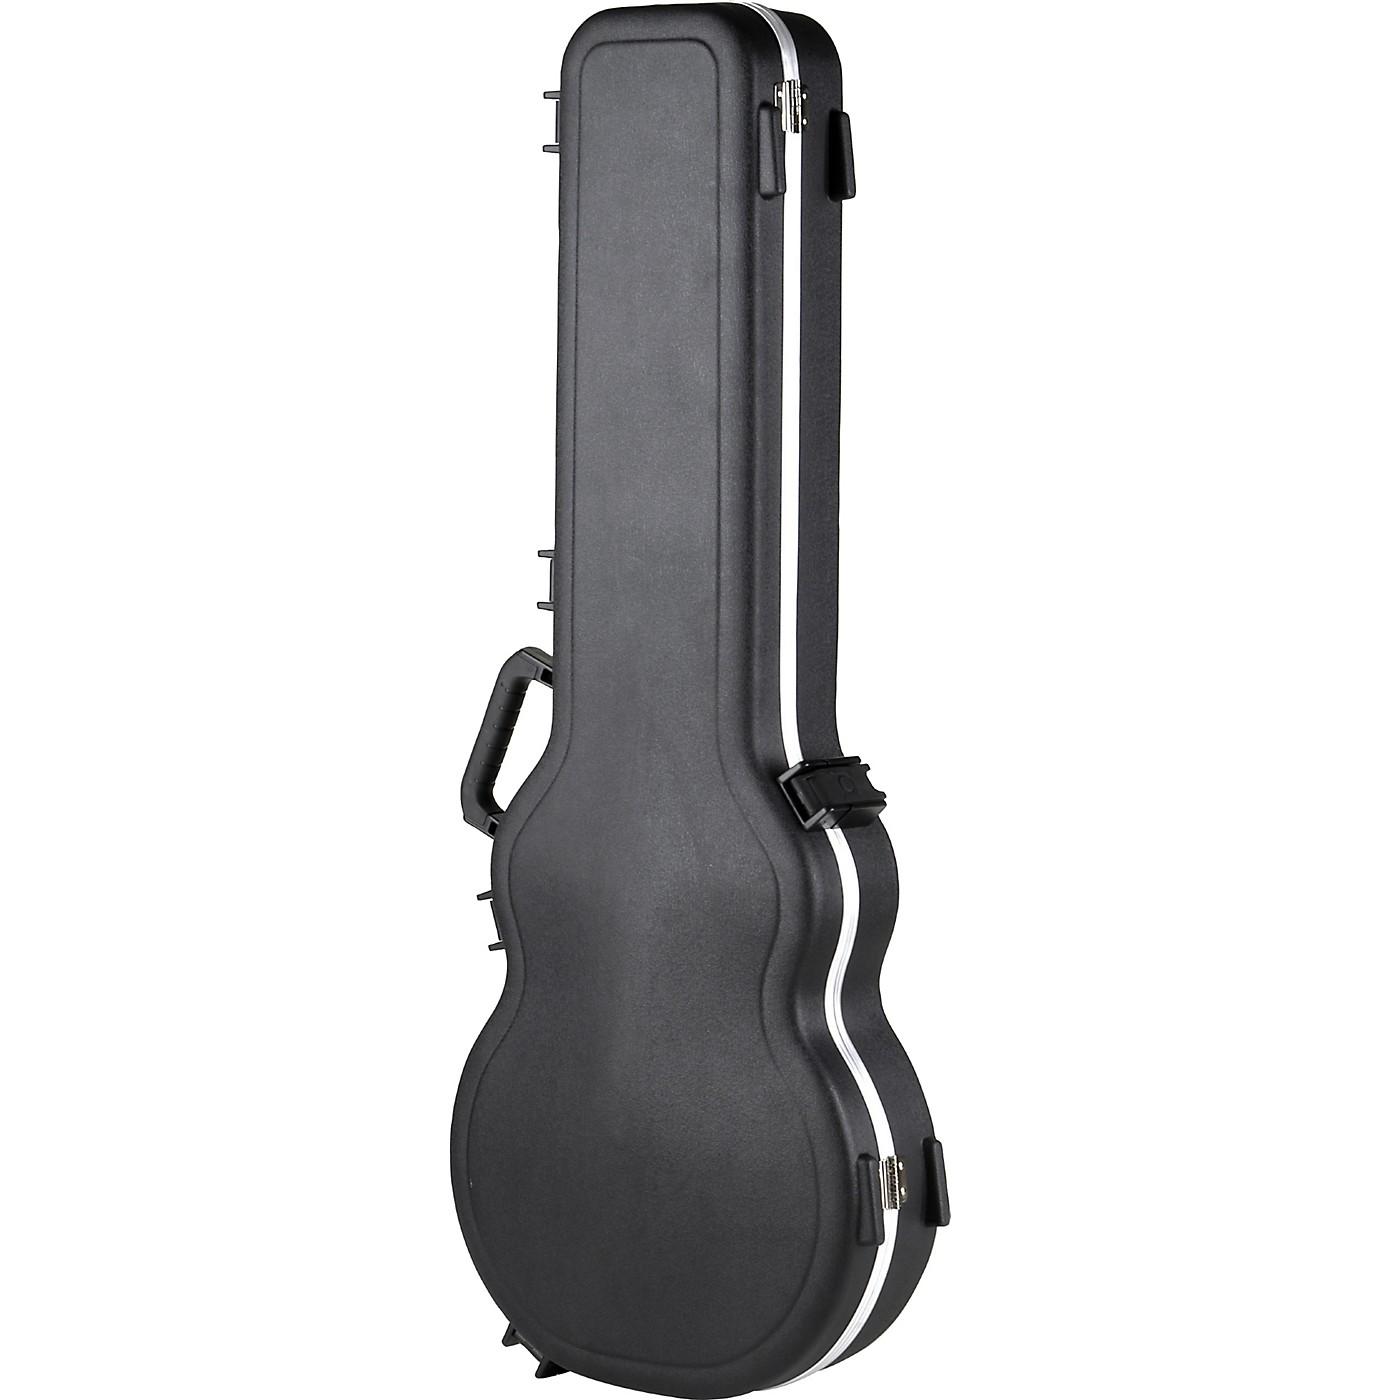 SKB SKB-56 Deluxe Single Cutaway Electric Guitar Case thumbnail